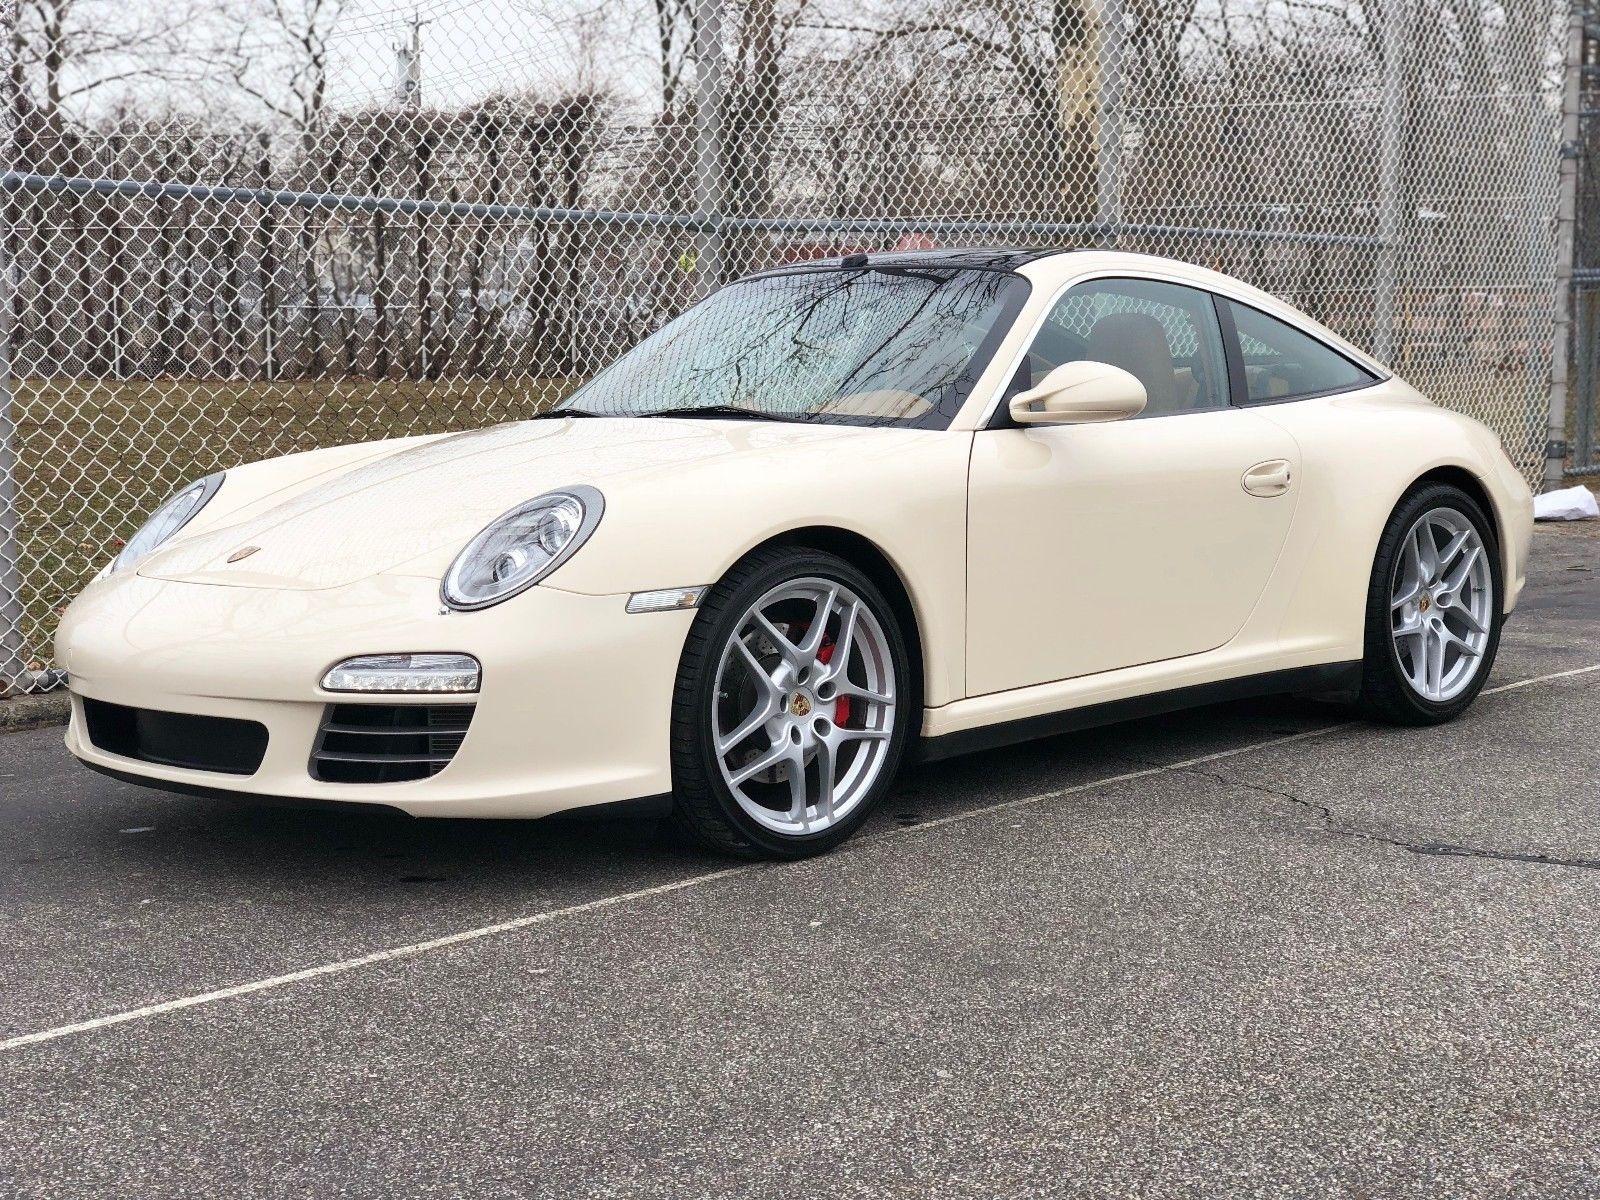 2012 Porsche 911 Targa 4s Stock 3110 For Sale Near Sunny